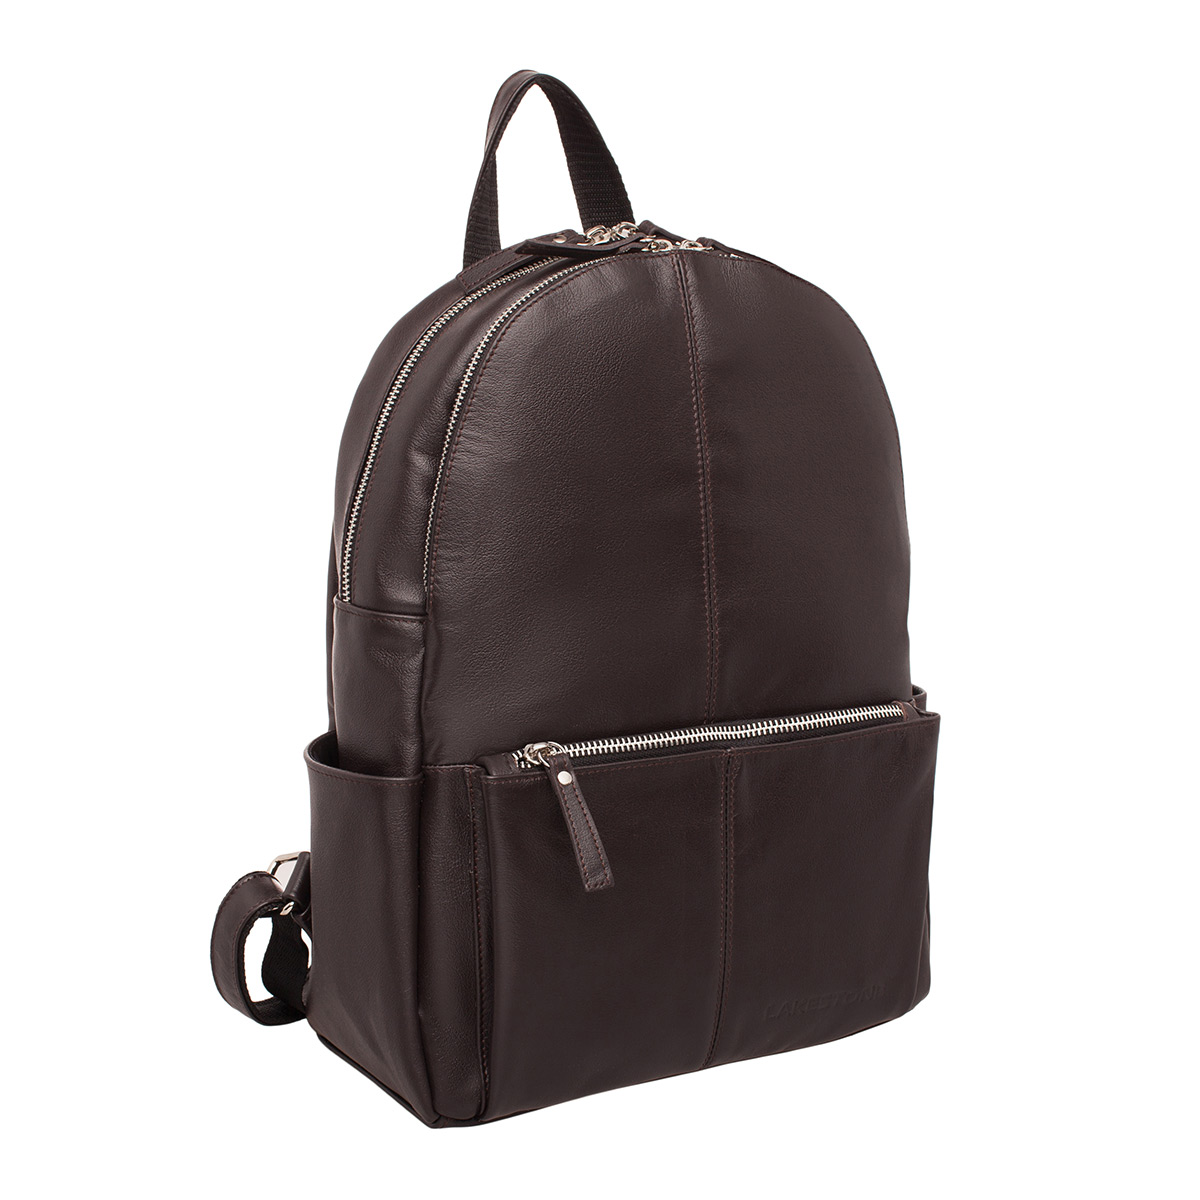 Рюкзак женский кожаный Lakestone 9123816/BR